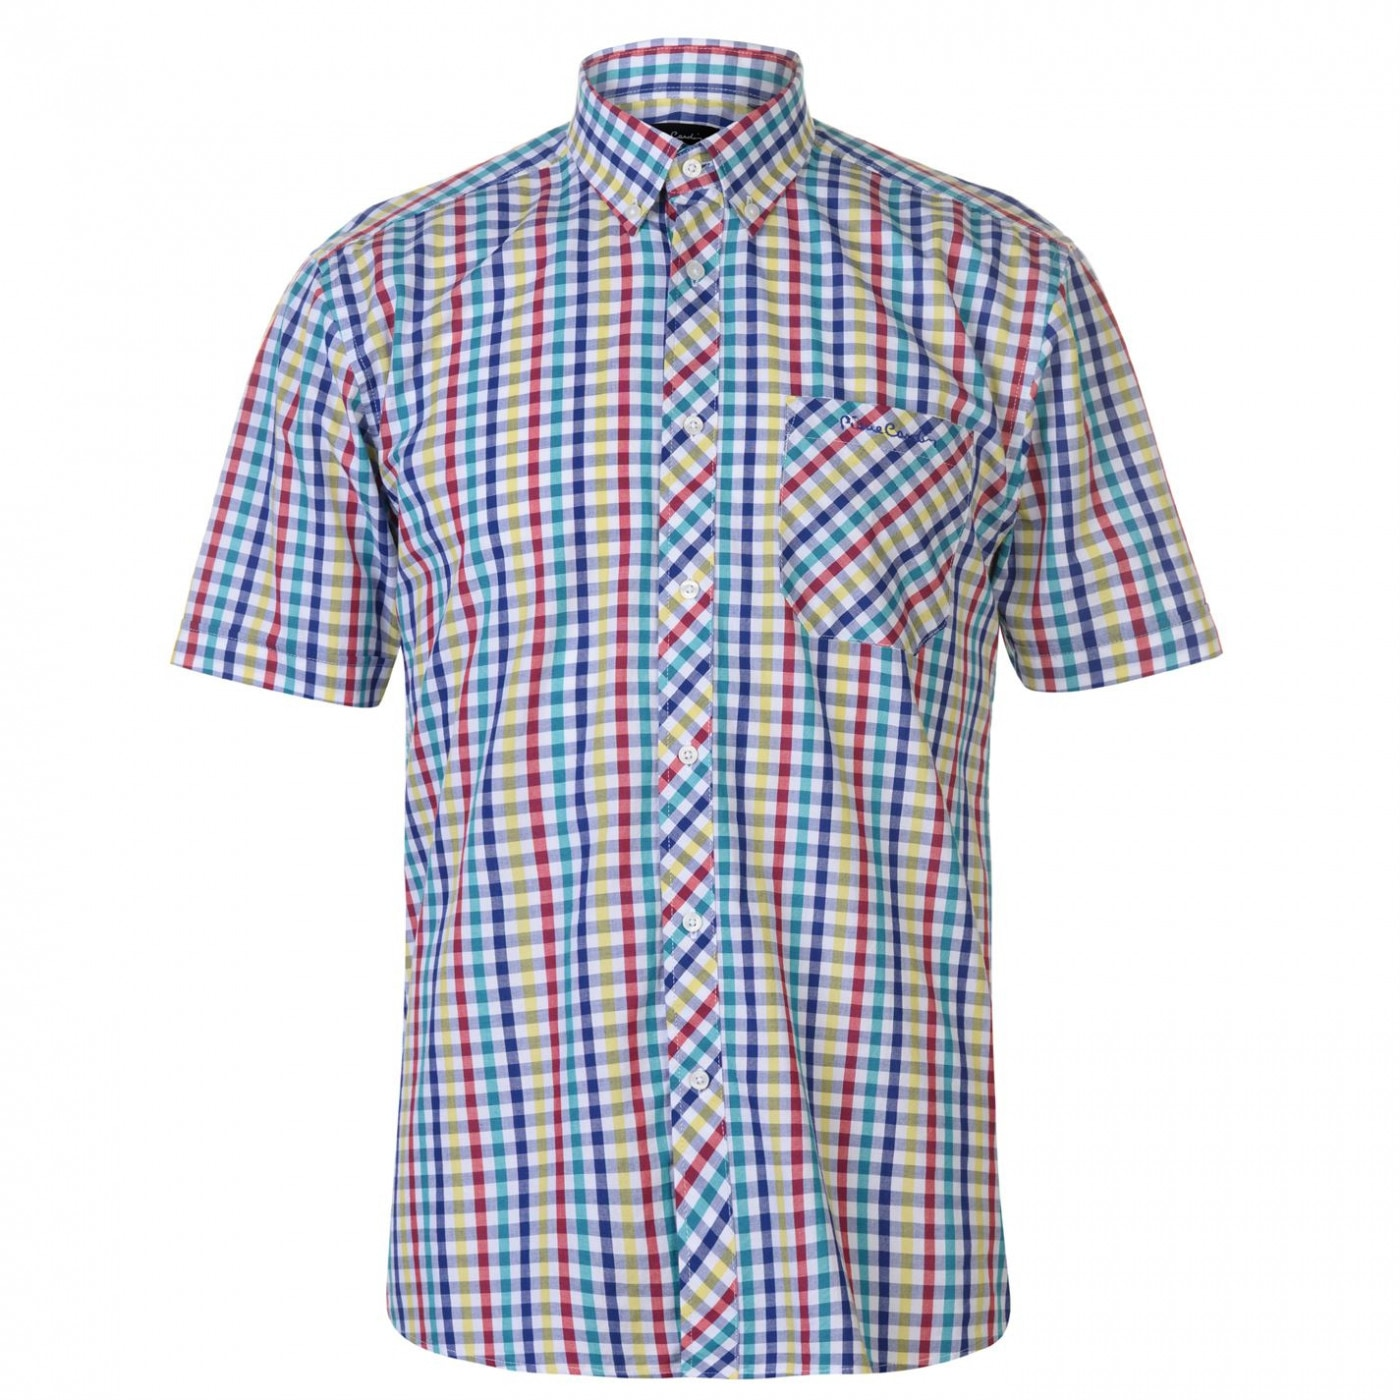 Pierre Cardin Coloured Gingham Short Sleeve Shirt Mens